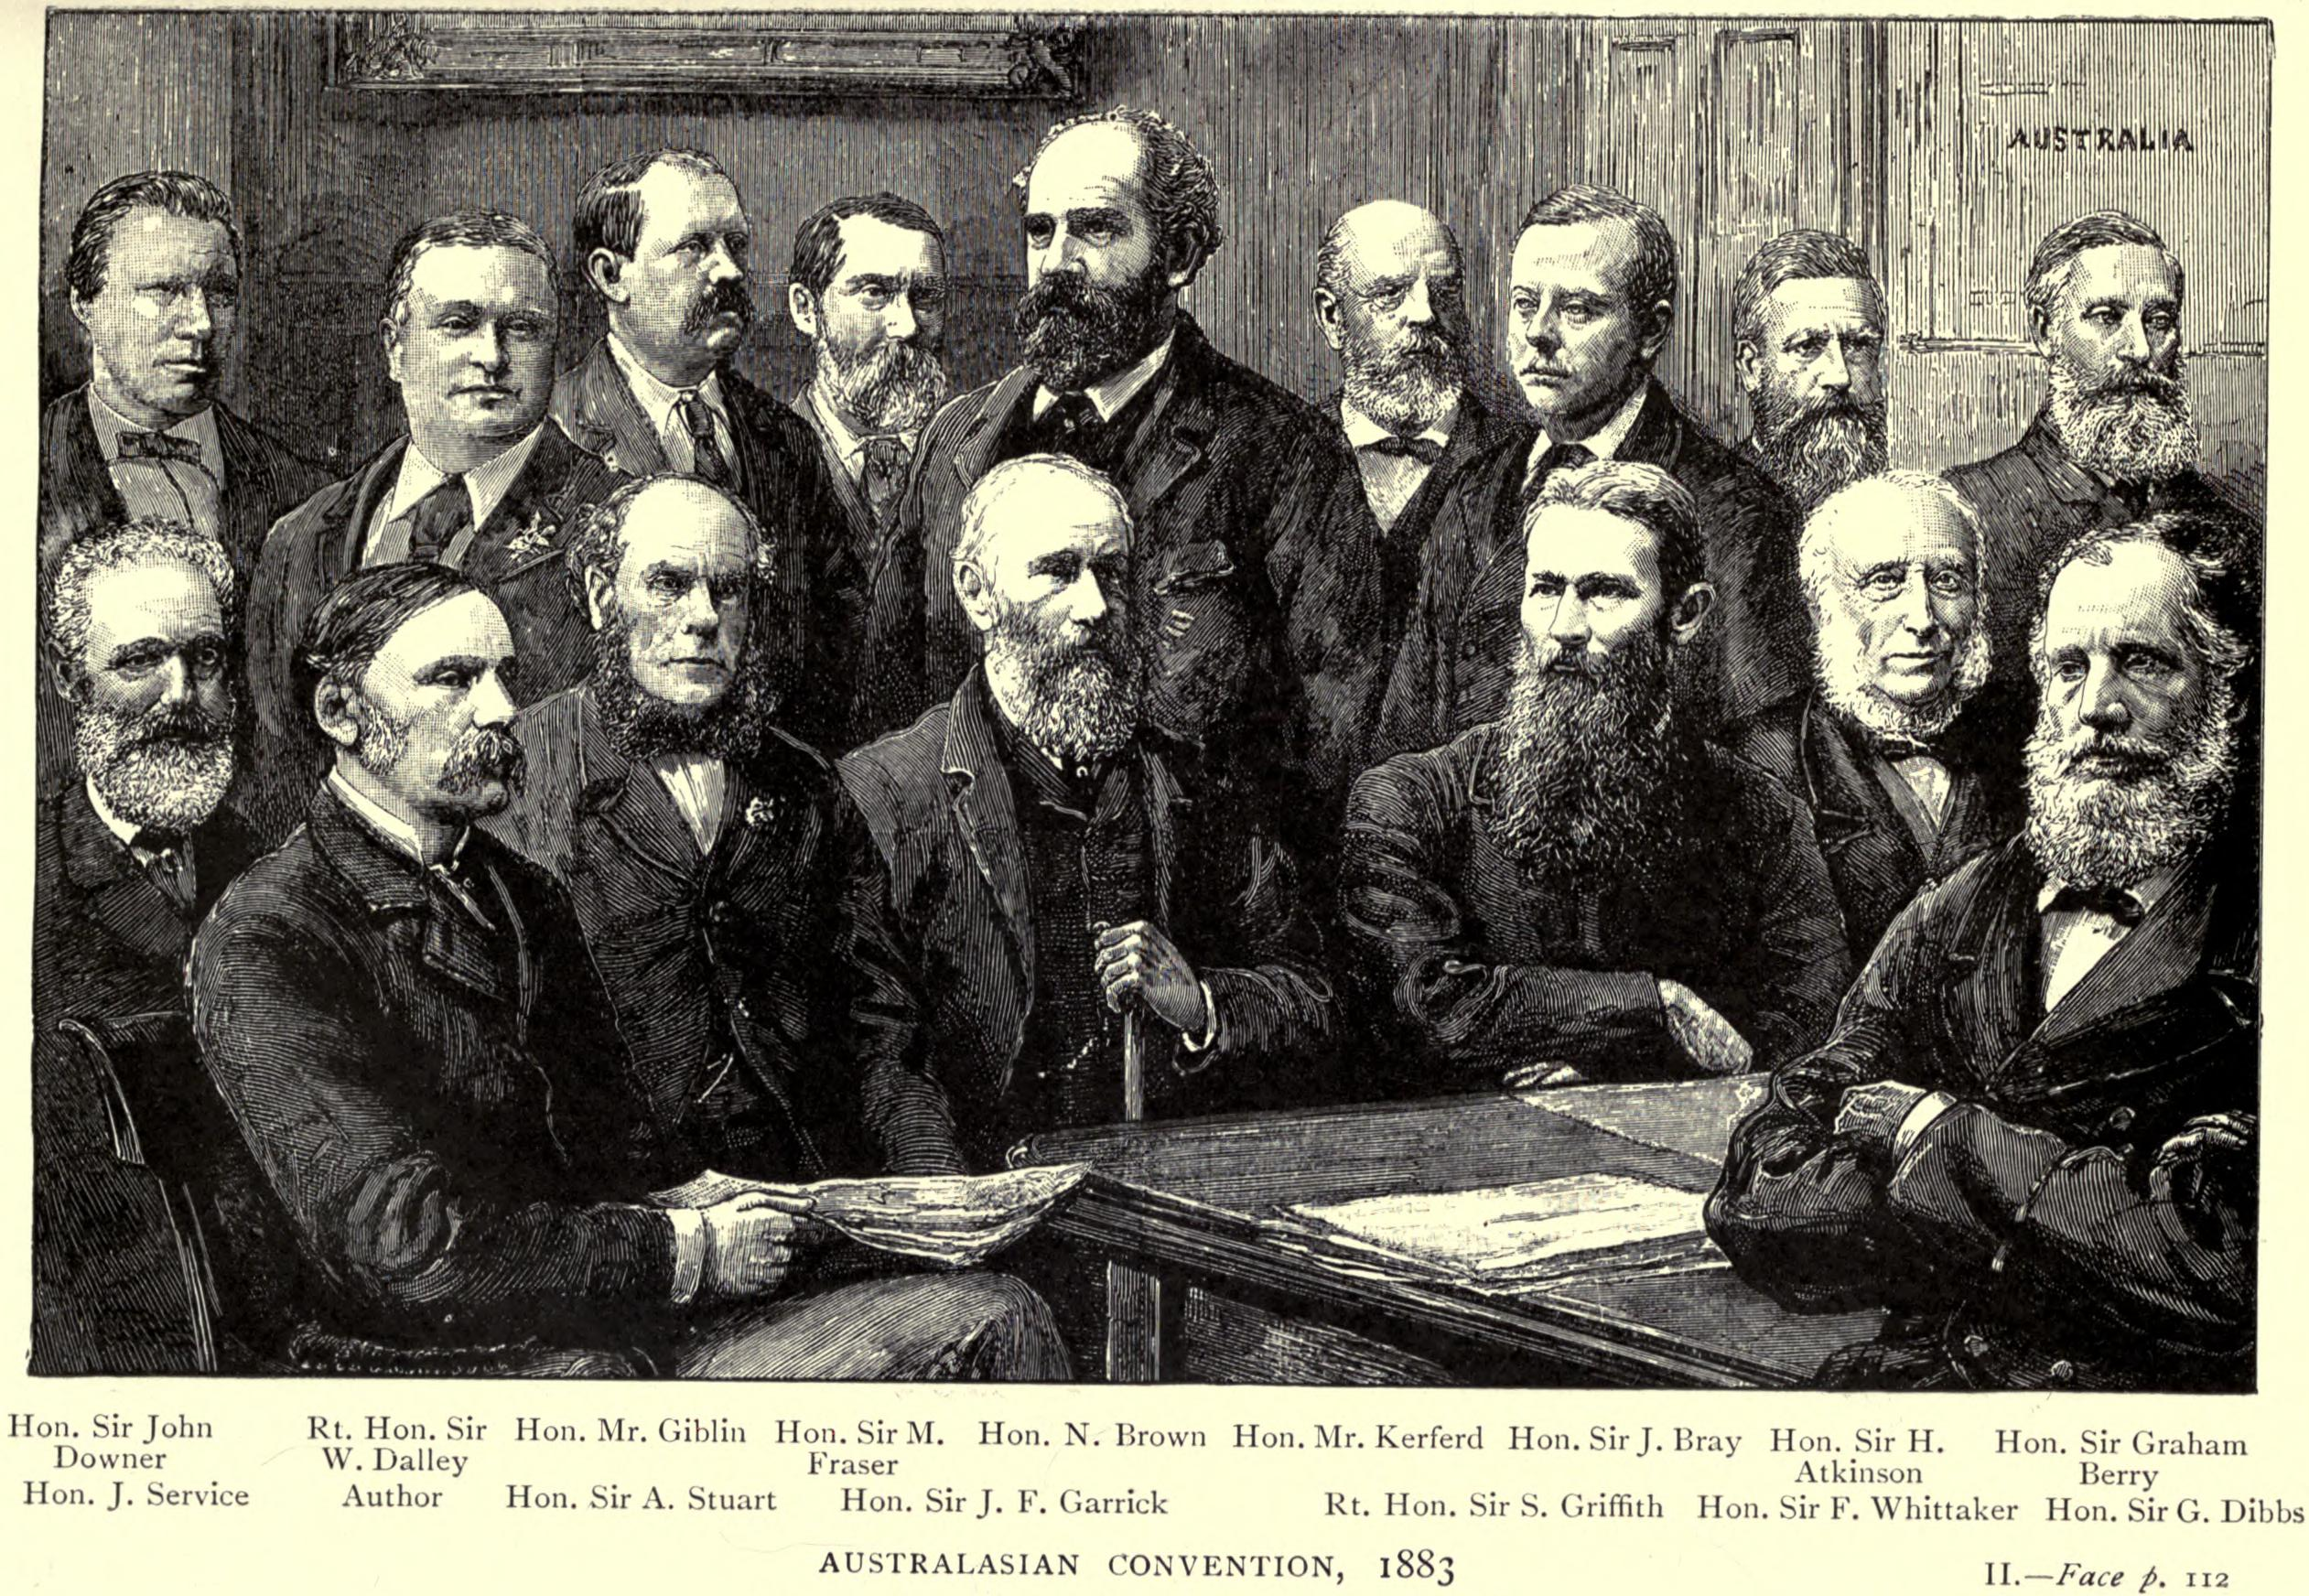 File:Australasian Convention, 1883.jpg